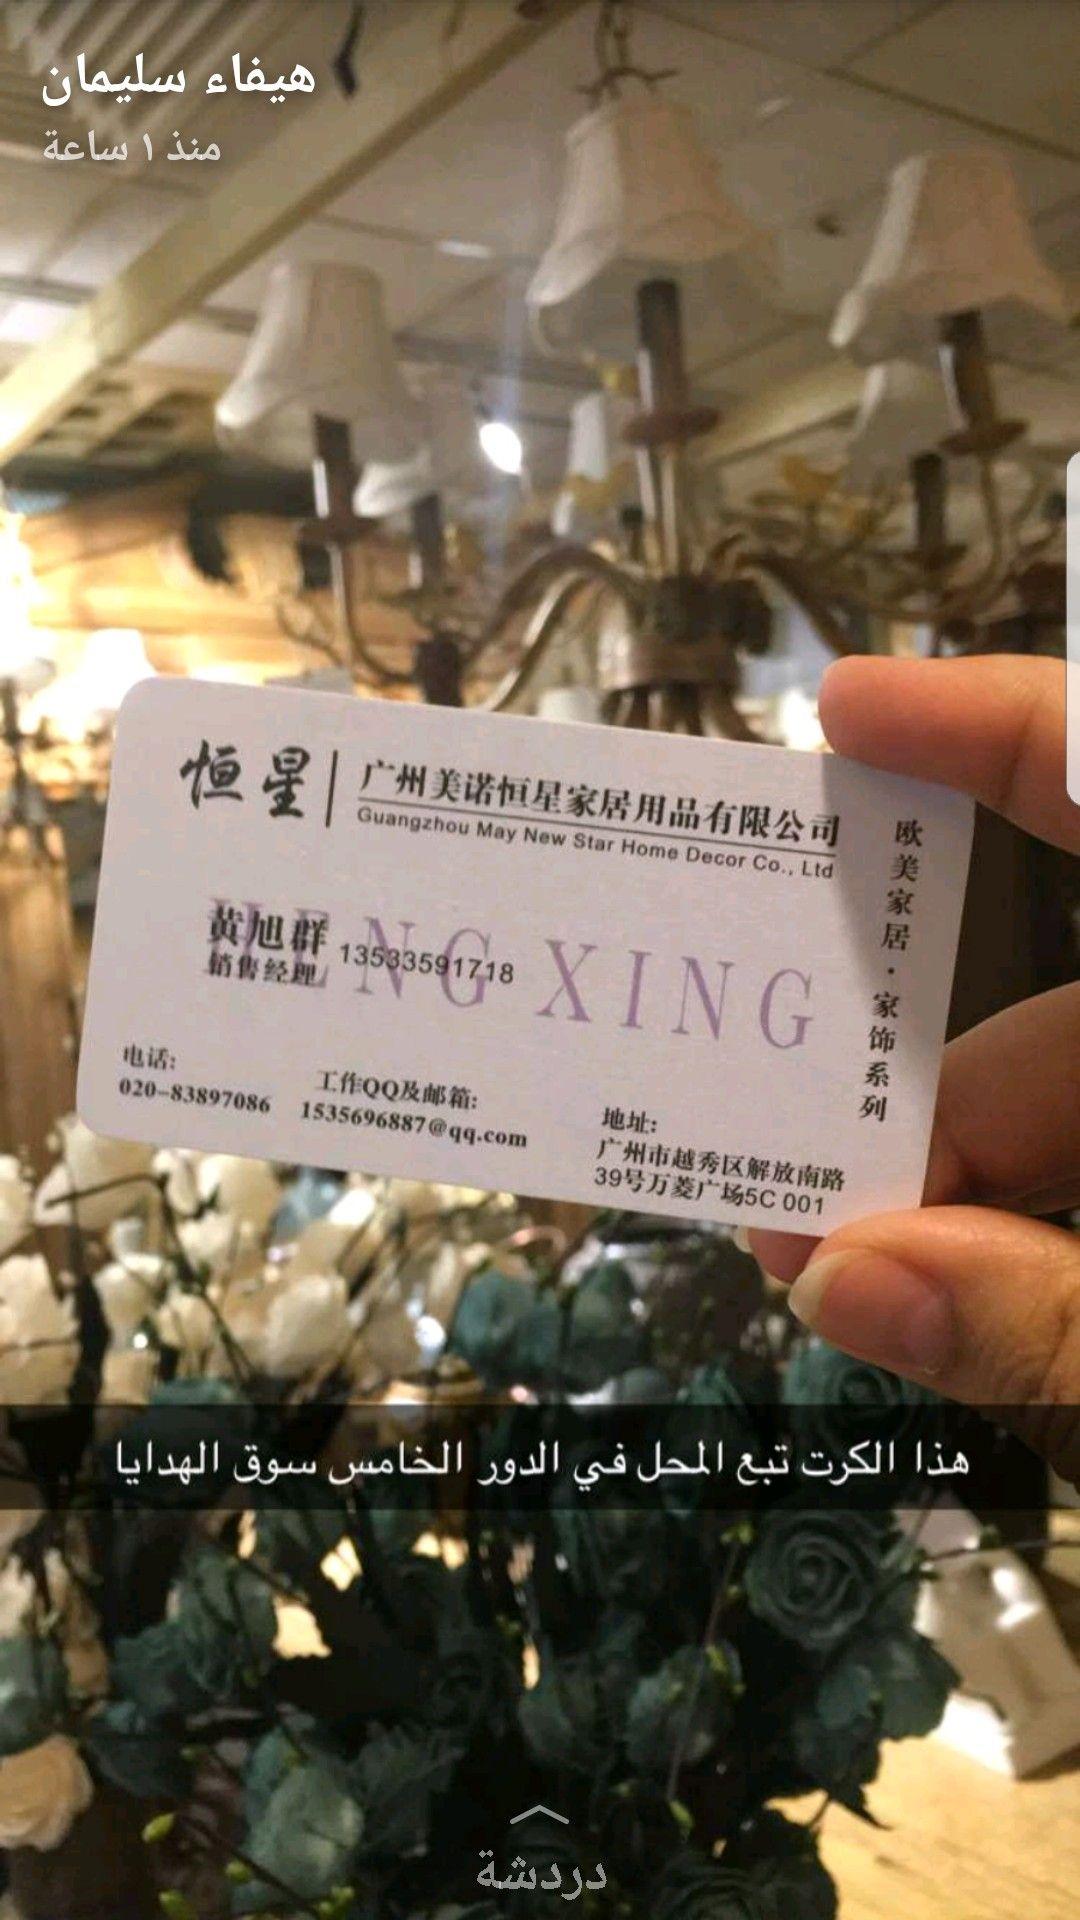 Pin By Mzoon27 On الصين Home Decor Decor New Star